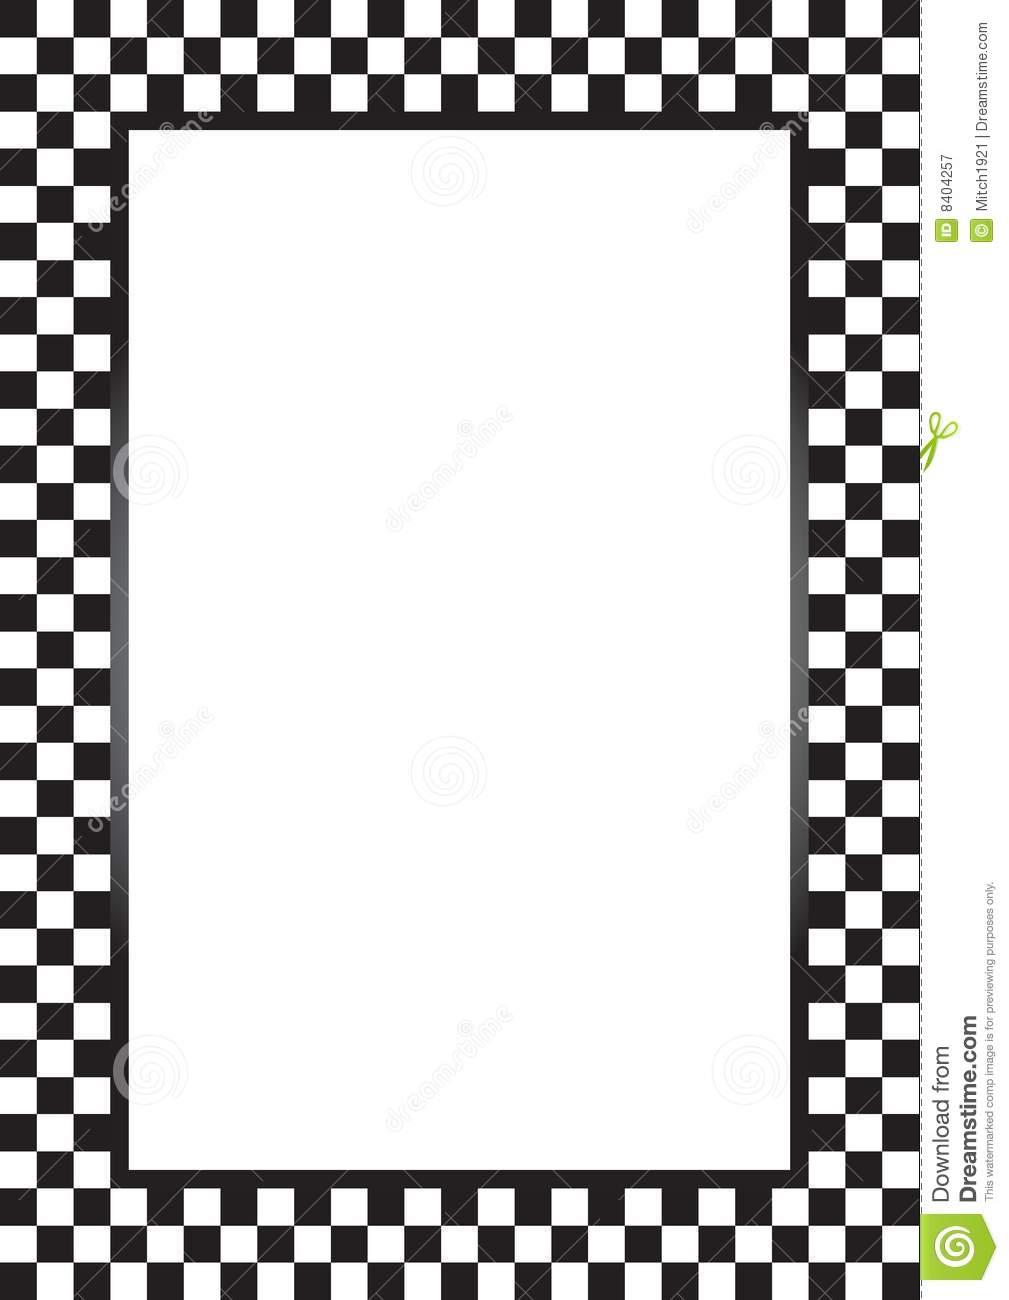 Checker border black and white clipart free clipart free download Free Checkered Border Cliparts, Download Free Clip Art, Free Clip ... clipart free download